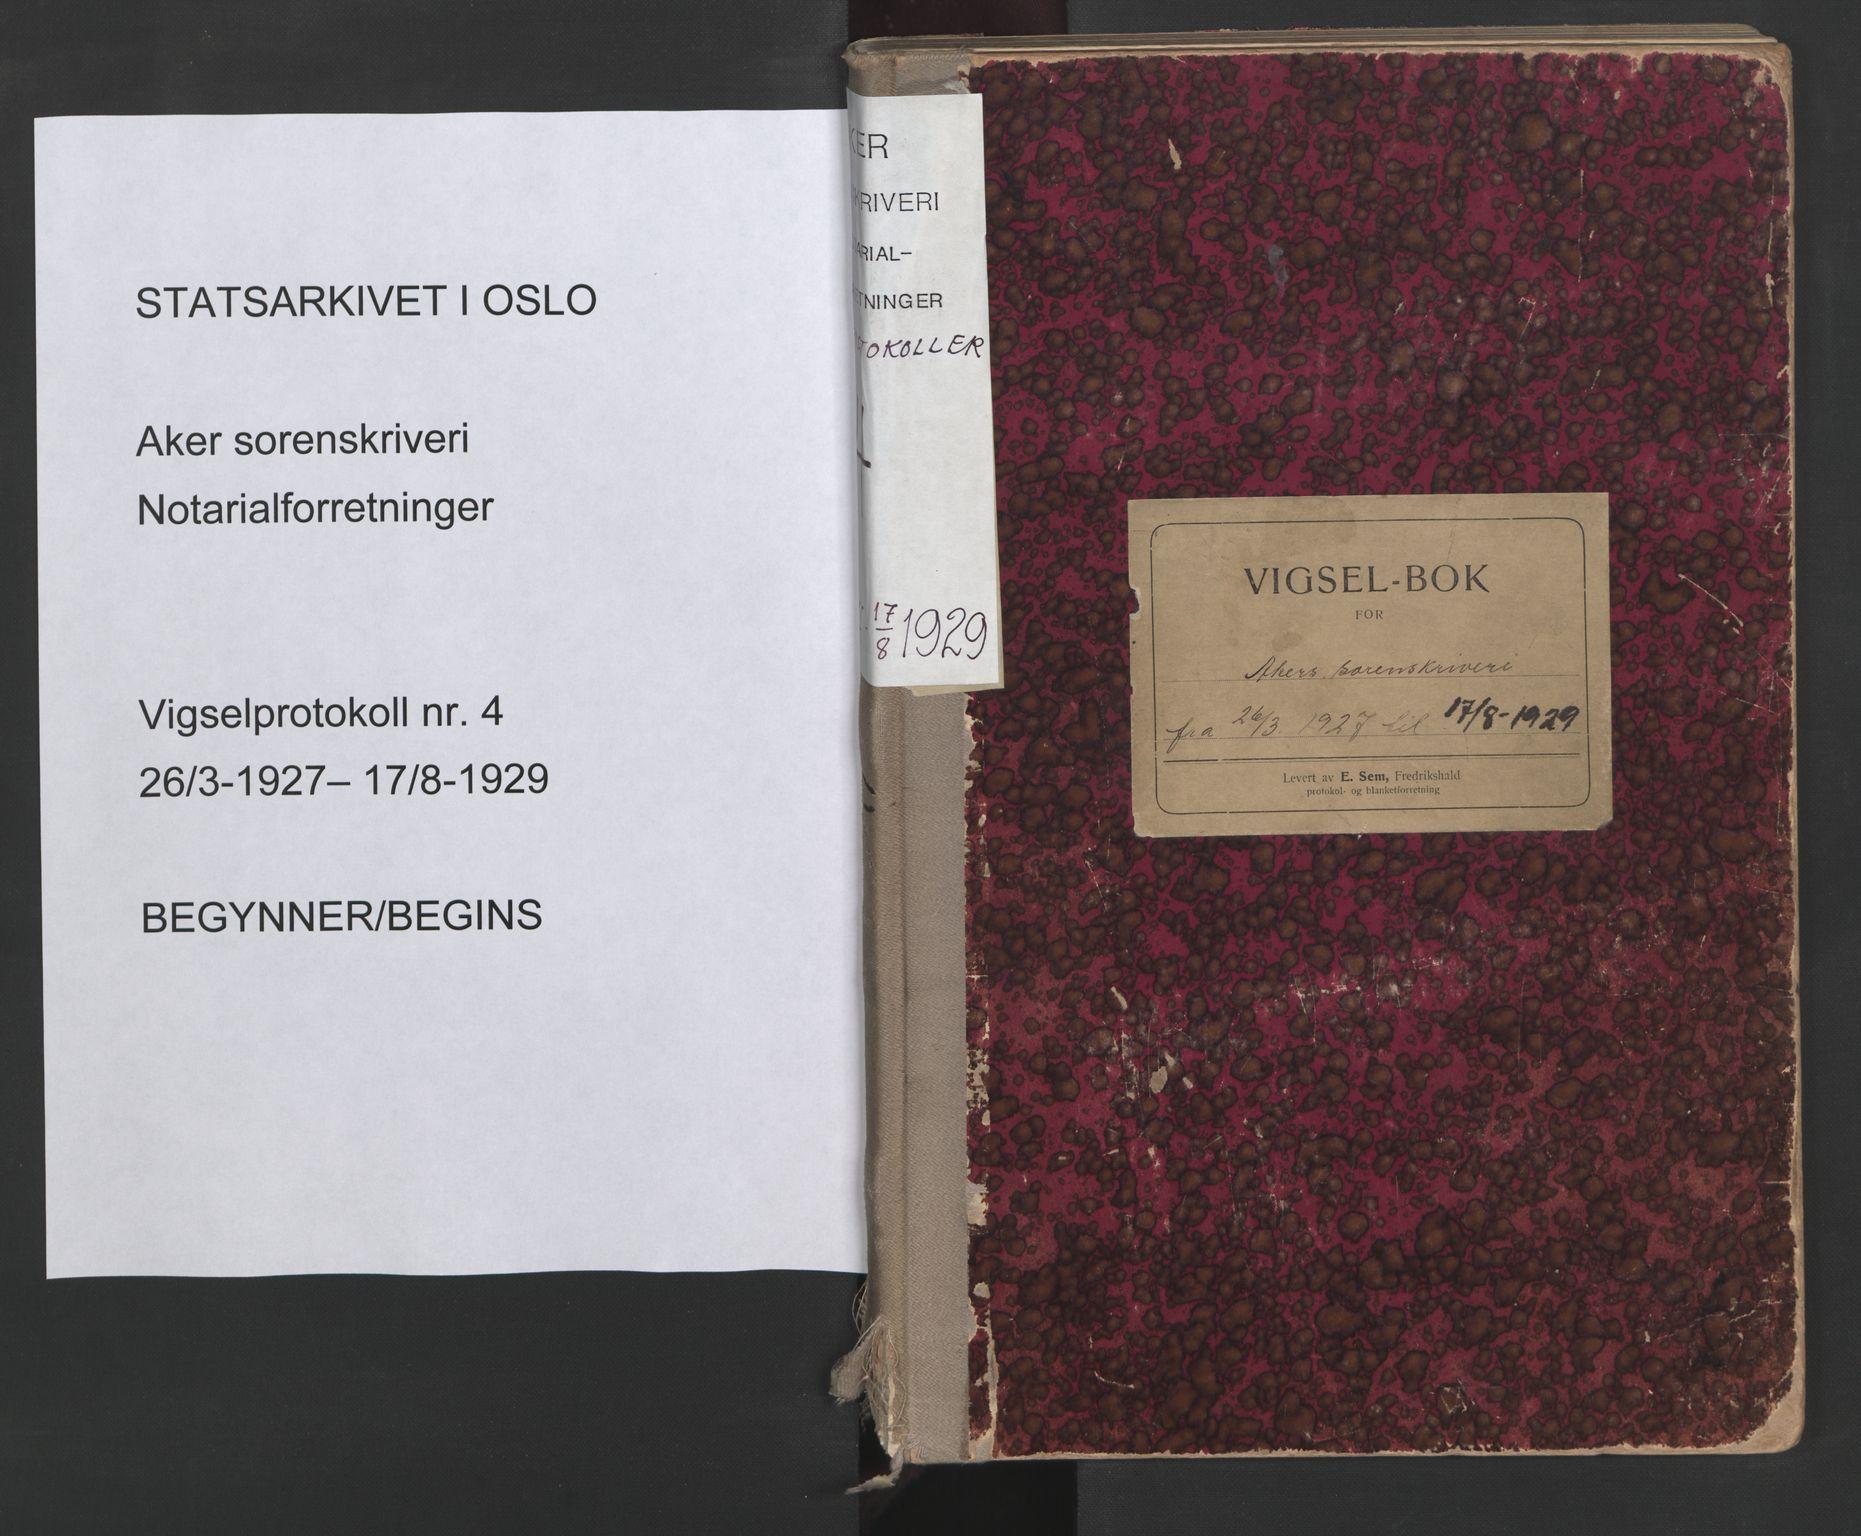 SAO, Aker sorenskriveri, L/Lc/Lcb/L0004: Vigselprotokoll, 1927-1929, s. upaginert